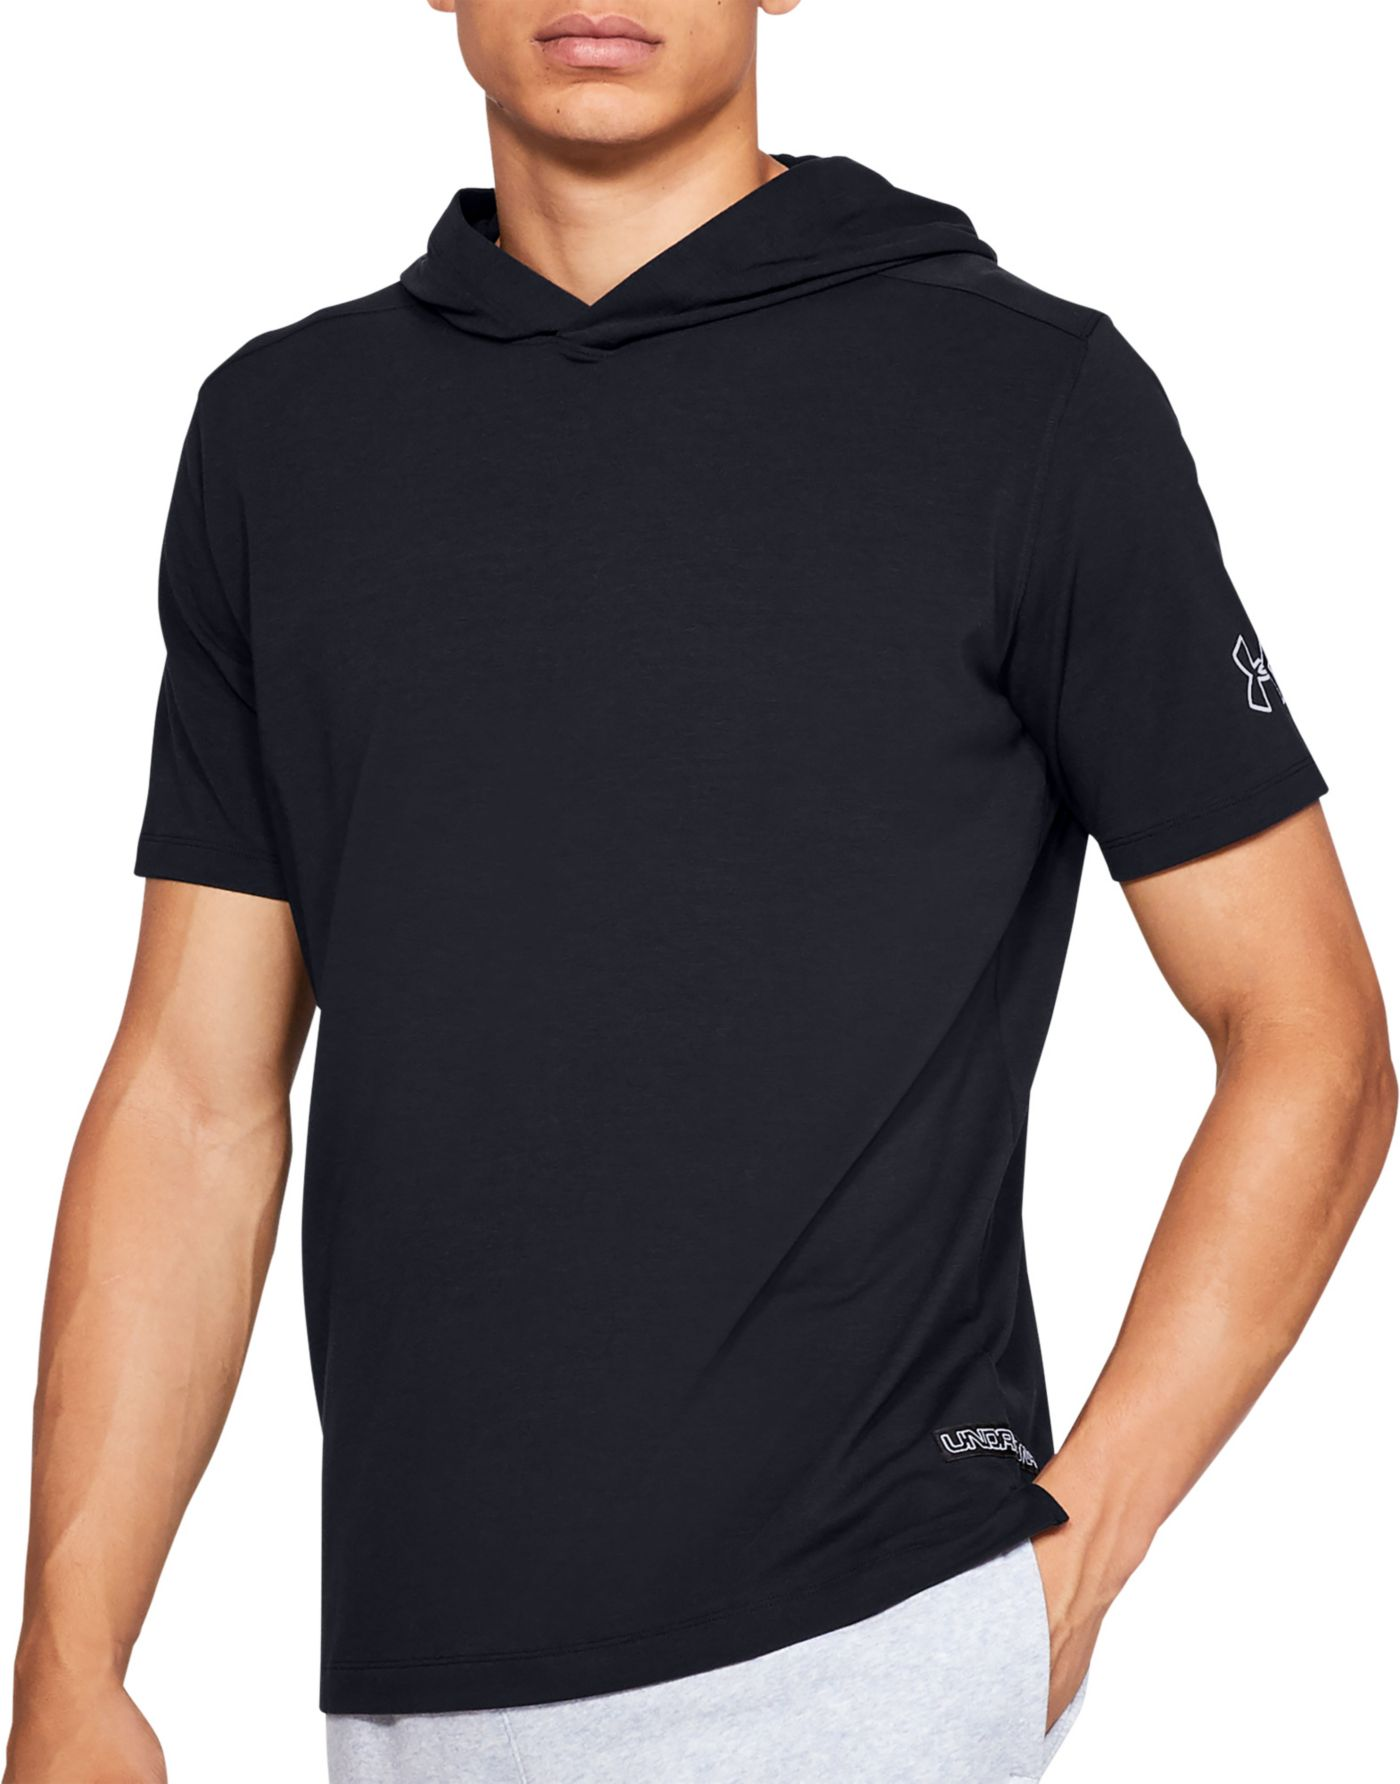 Under Armour Men's Short Sleeve Hooded T-Shirt